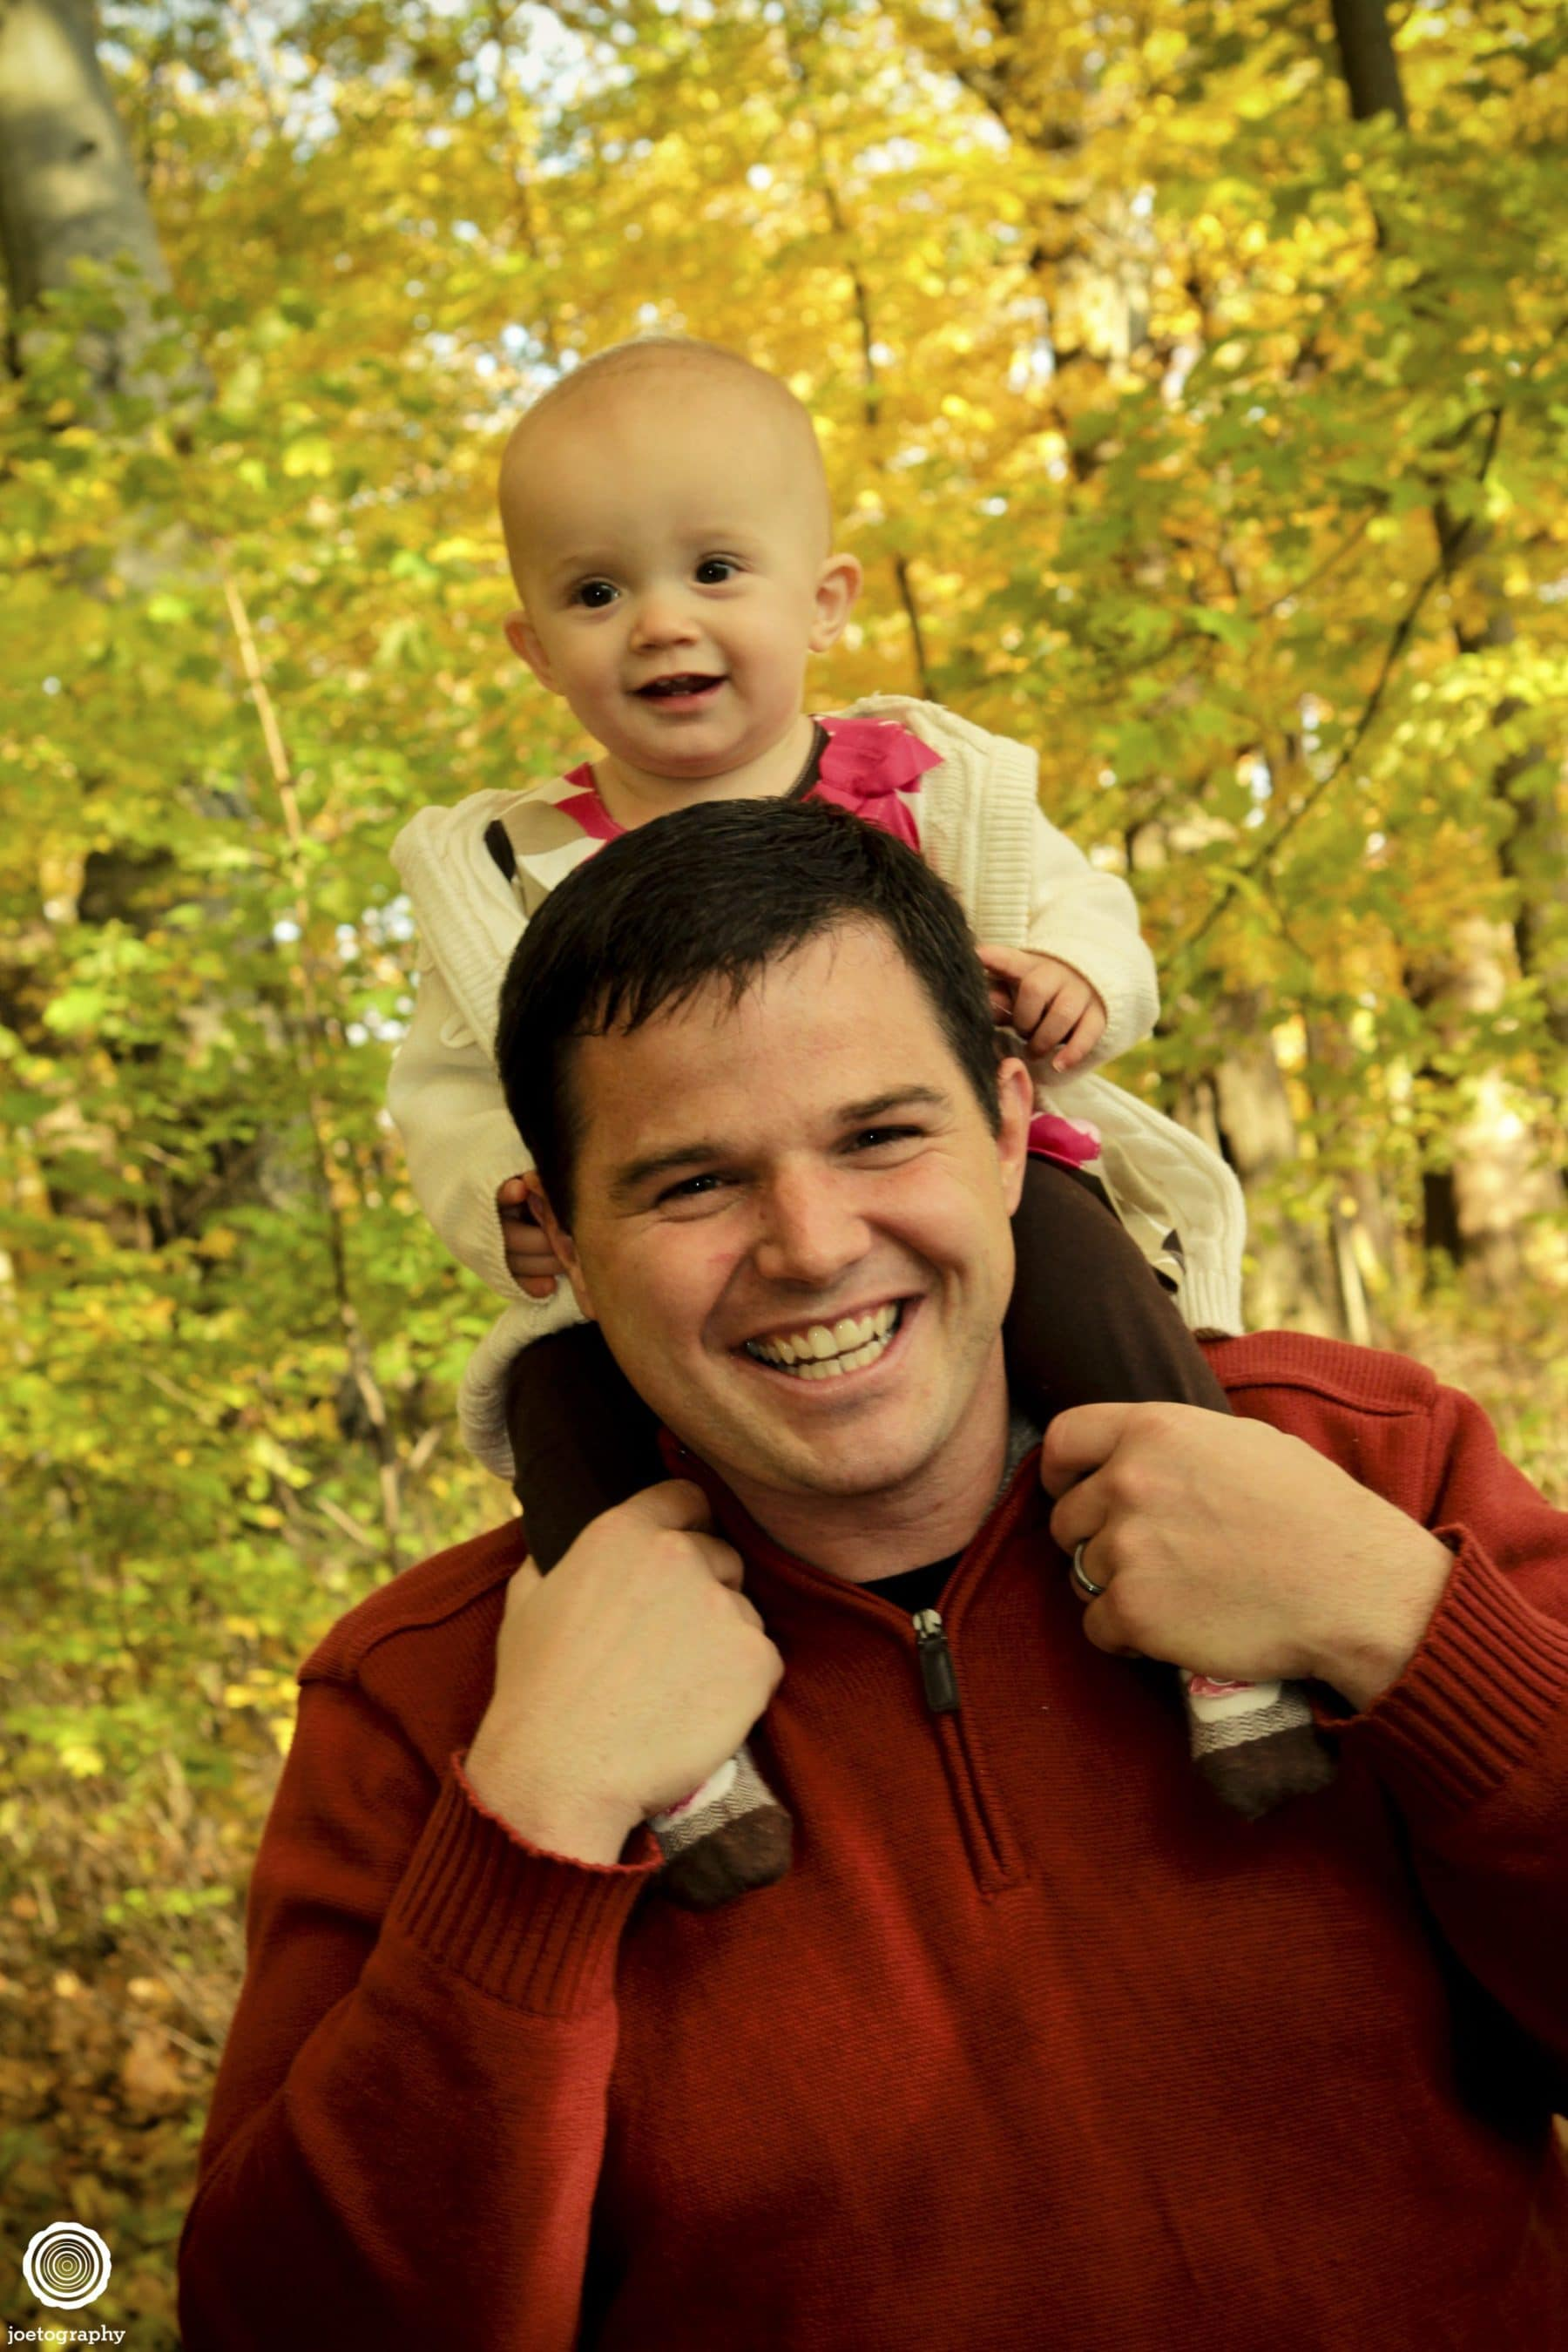 Albert-Family-Photographs-Fishers-Indiana-16